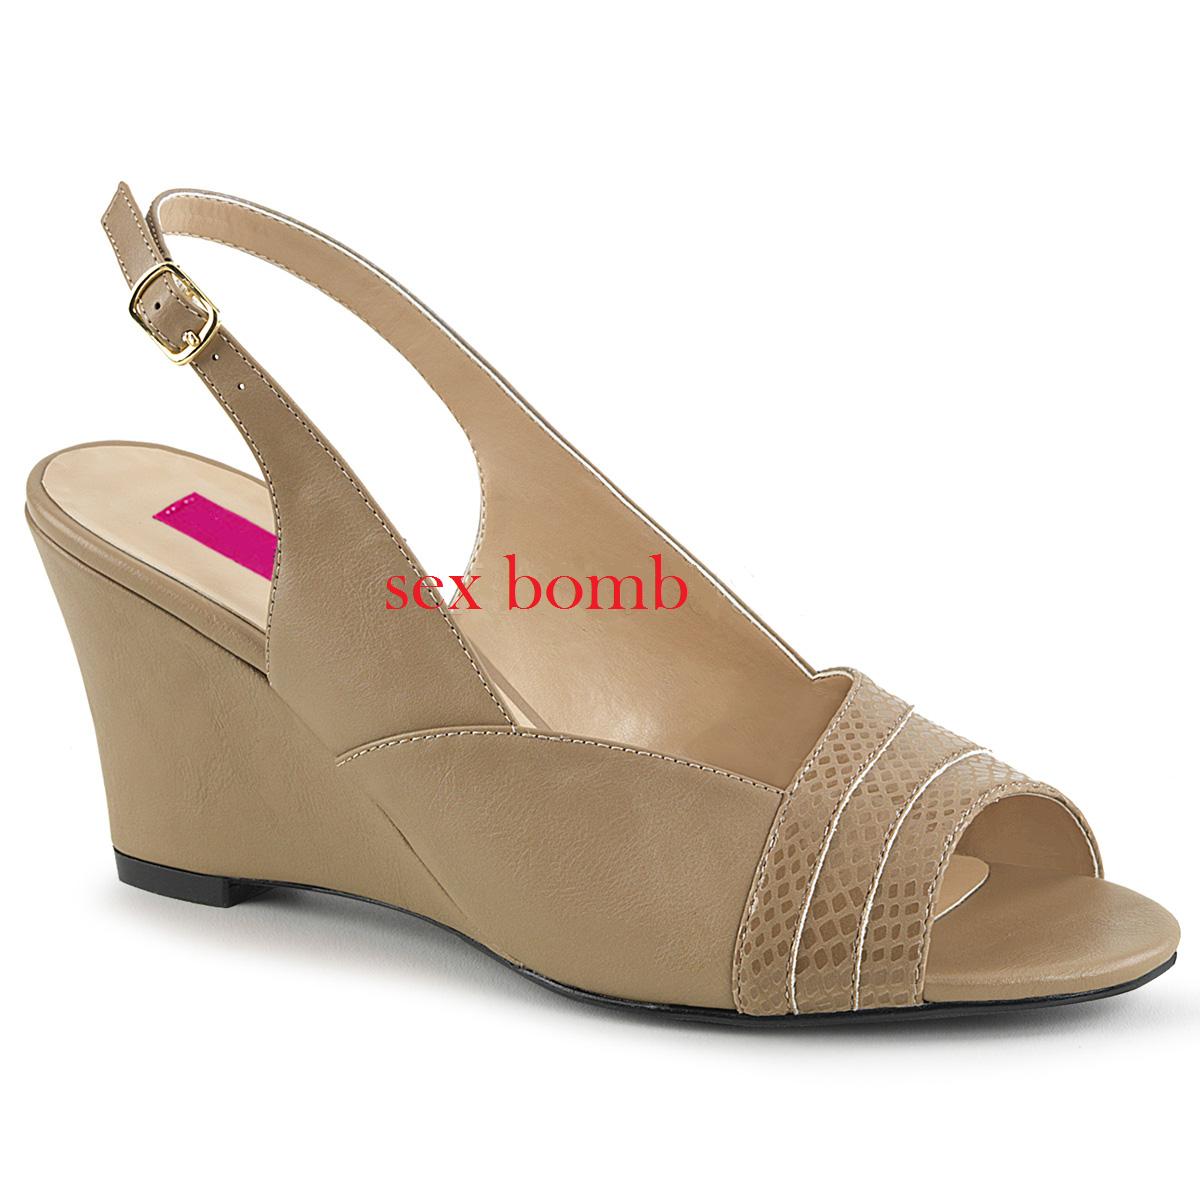 SANDALI tacco 7,5 ZEPPA dal 39 al 46 TORTORA TORTORA TORTORA OPACO cinturino zapatos SEXY glamour 8dd29b